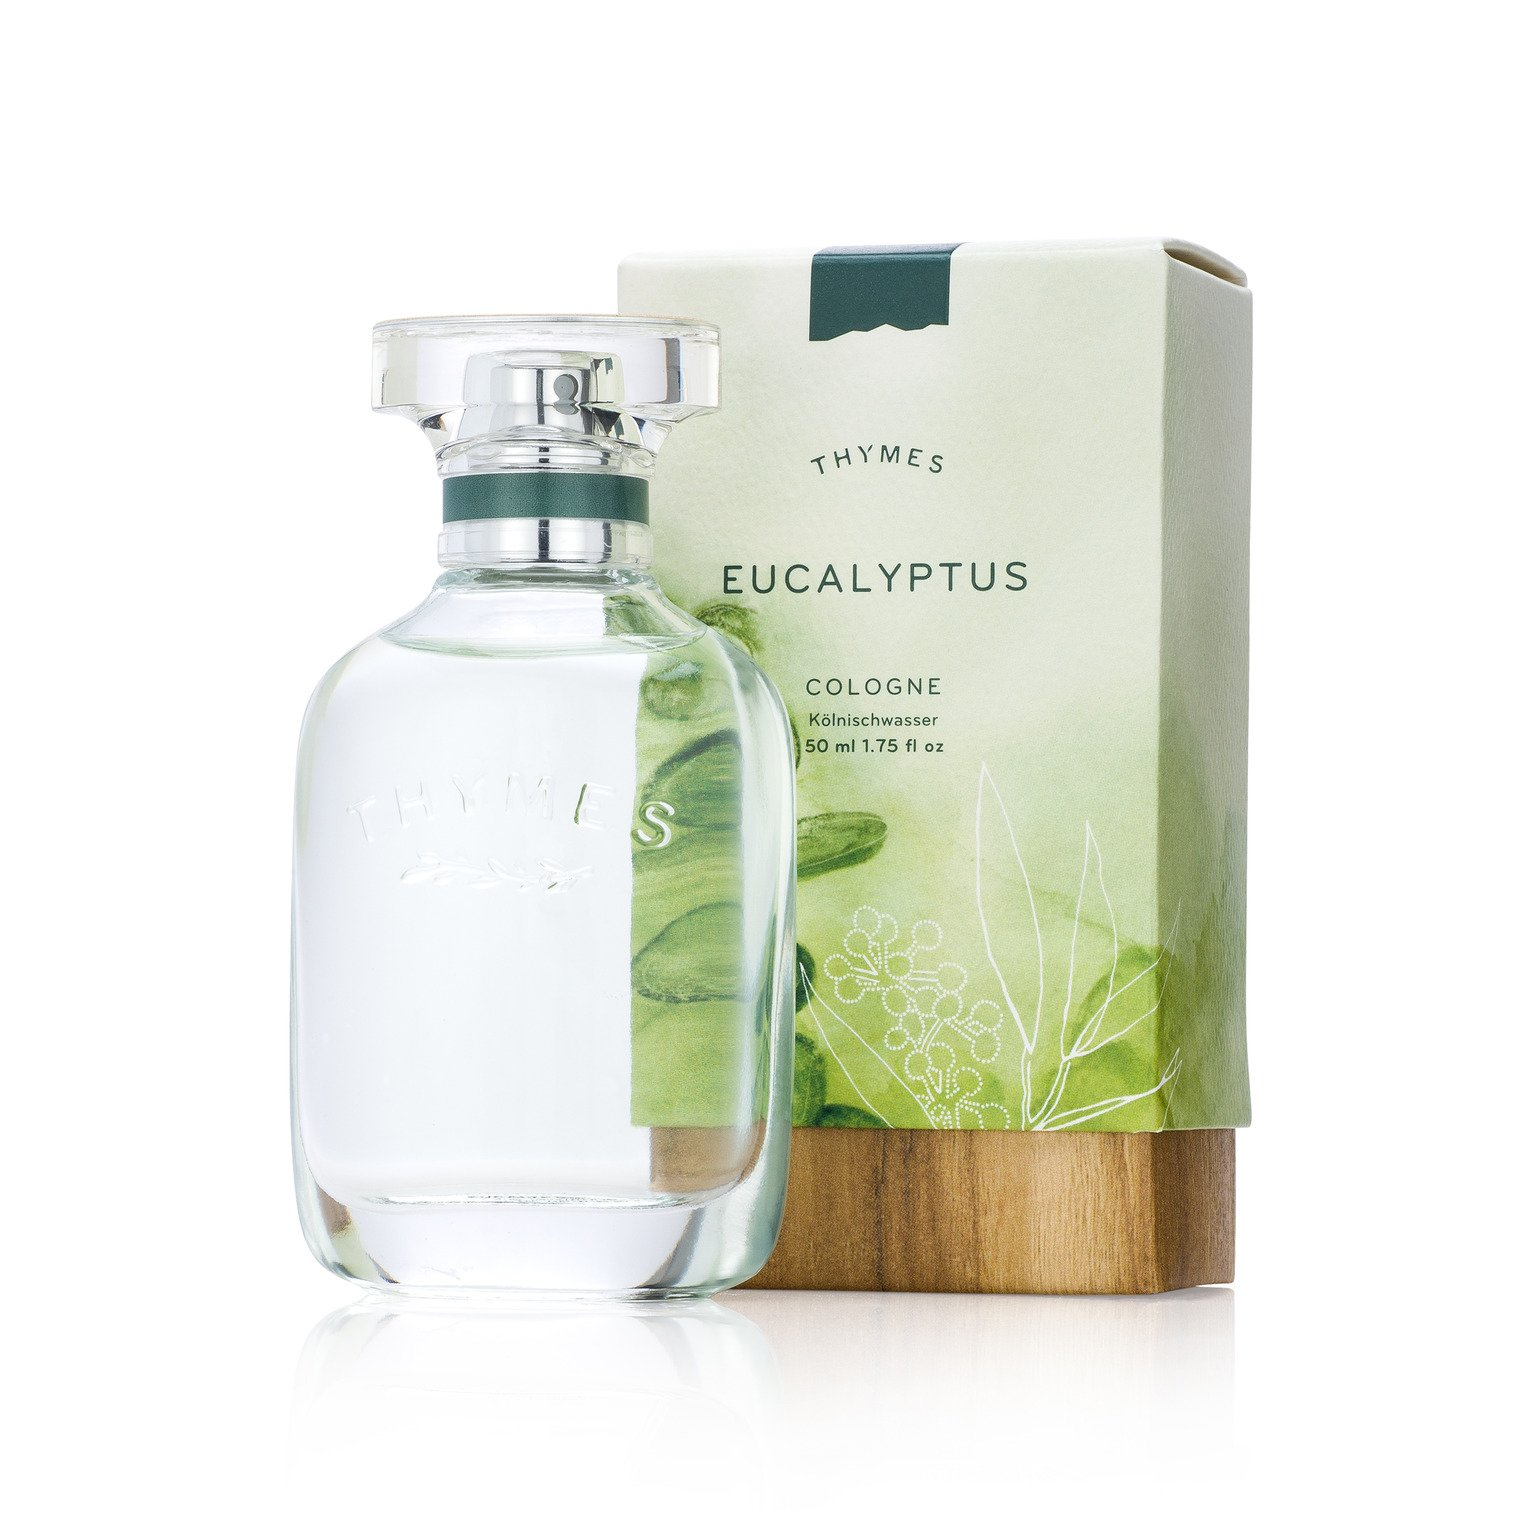 Thymes - Eucalyptus Cologne - Fresh Unisex Fragrance - 1.75 oz